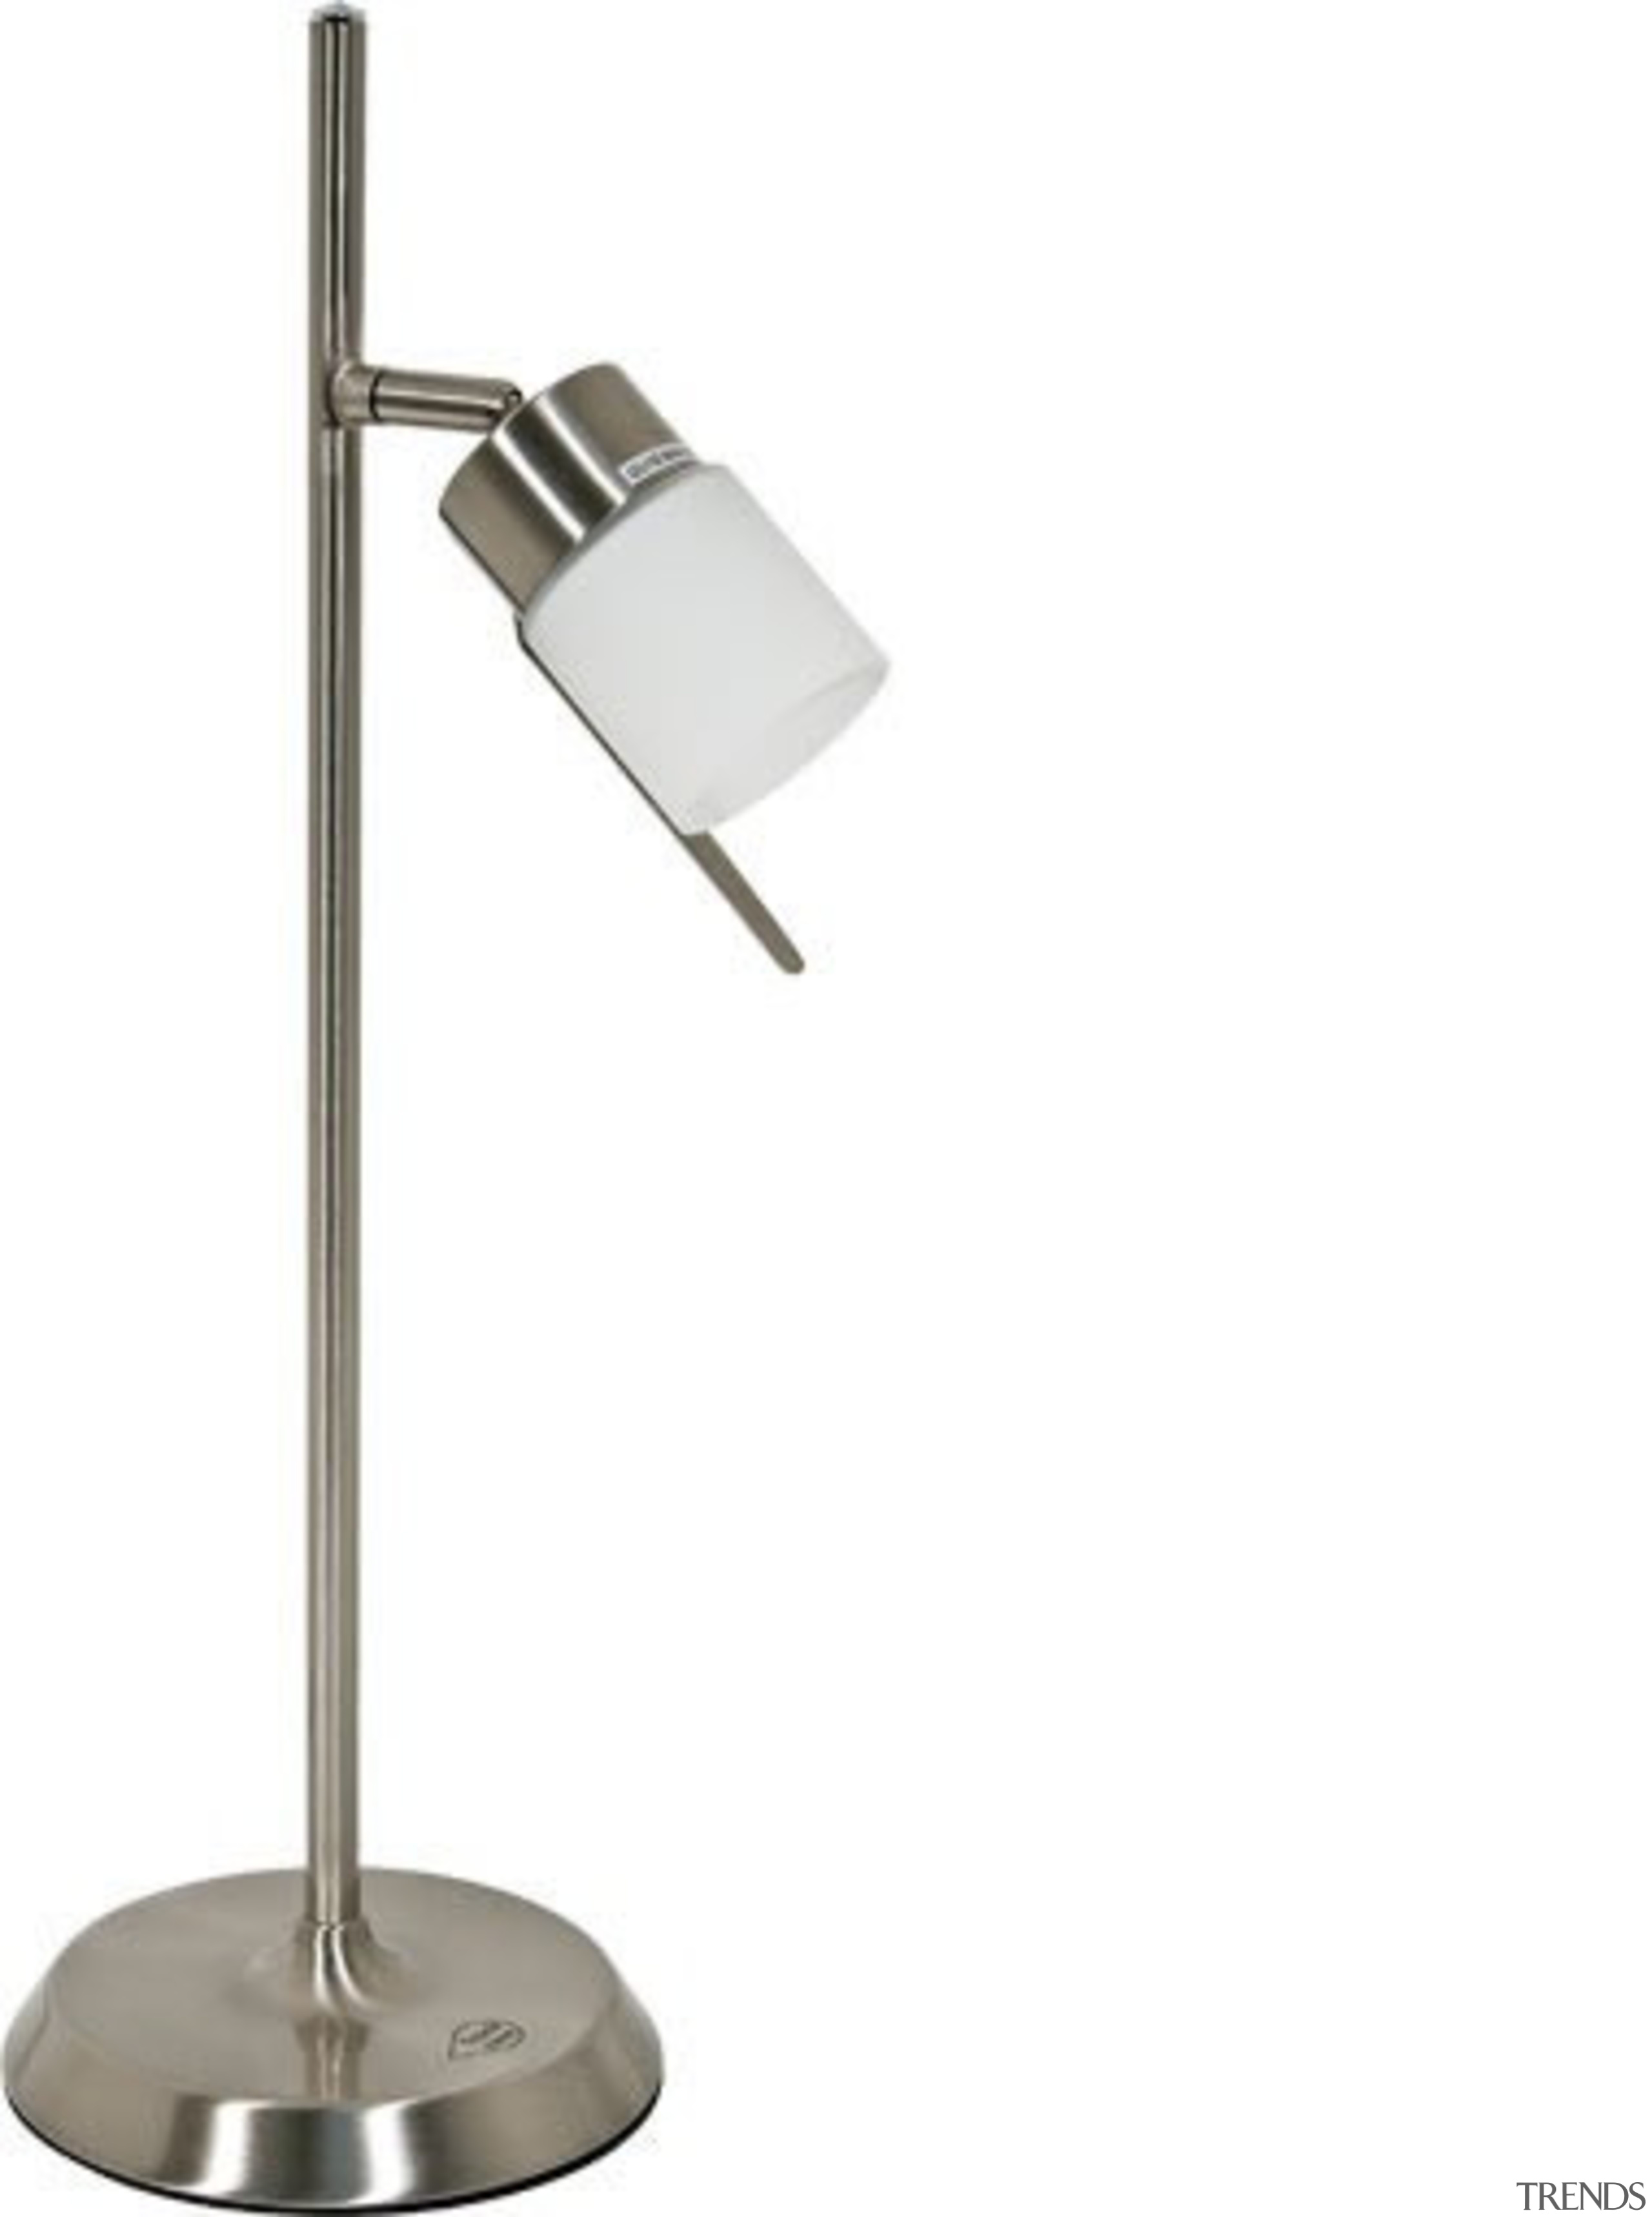 FeaturesA minimalist task light with an opal glass light fixture, lighting, product design, white